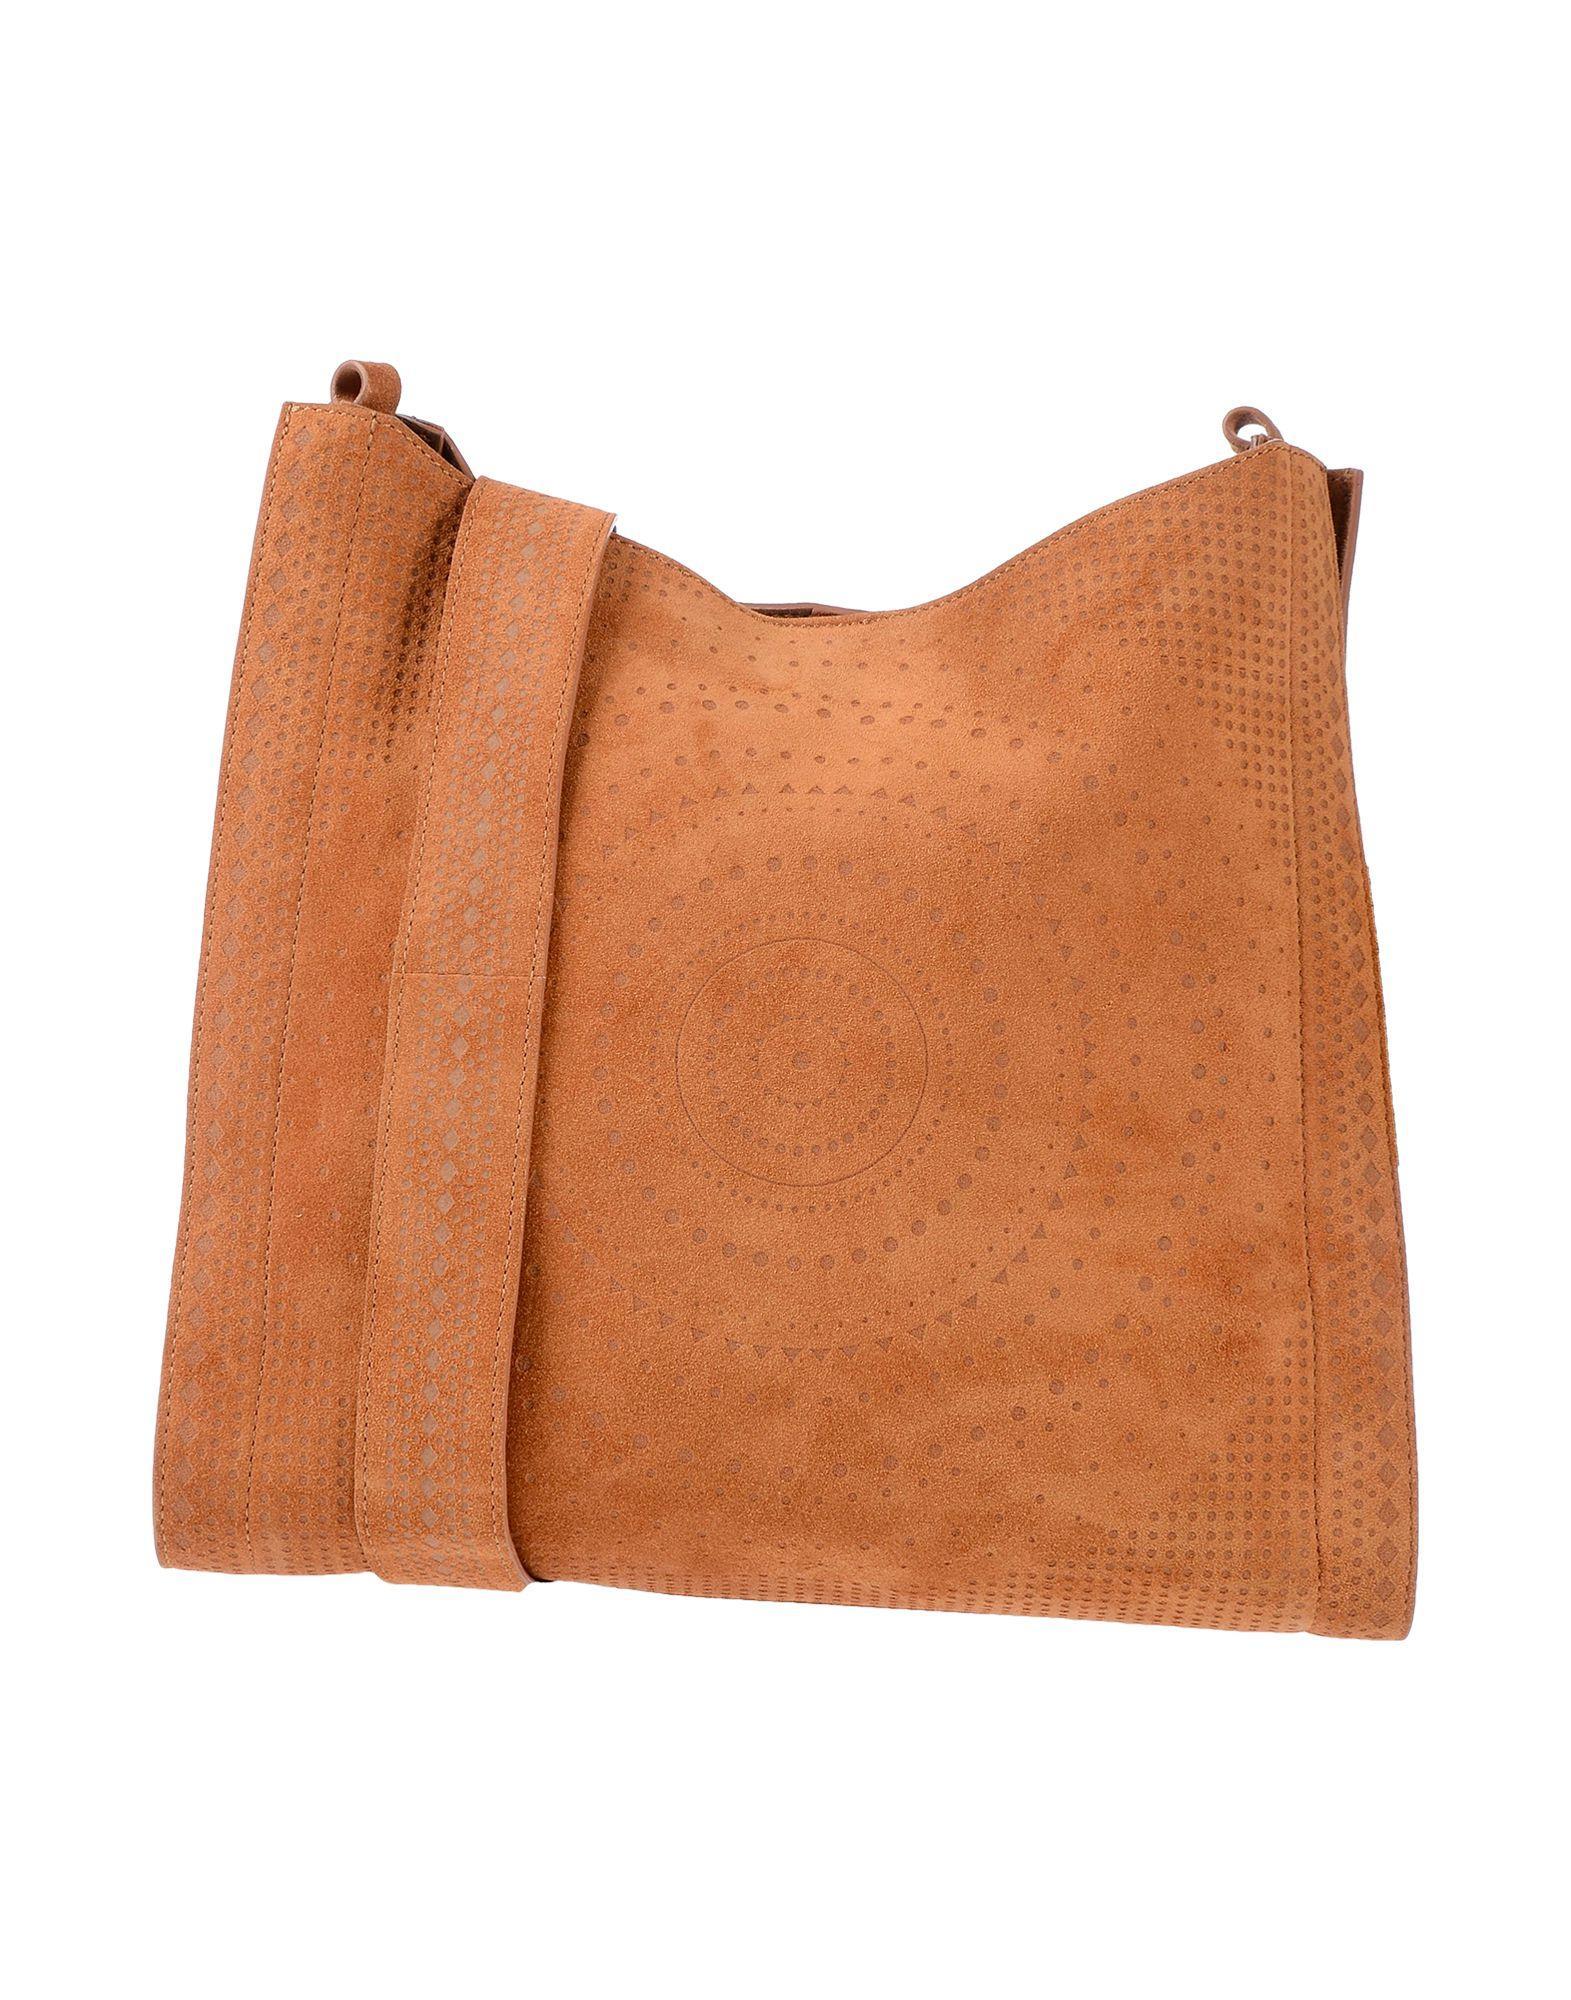 Body Orciani Bag Cross Brown In Lyst qHTwC